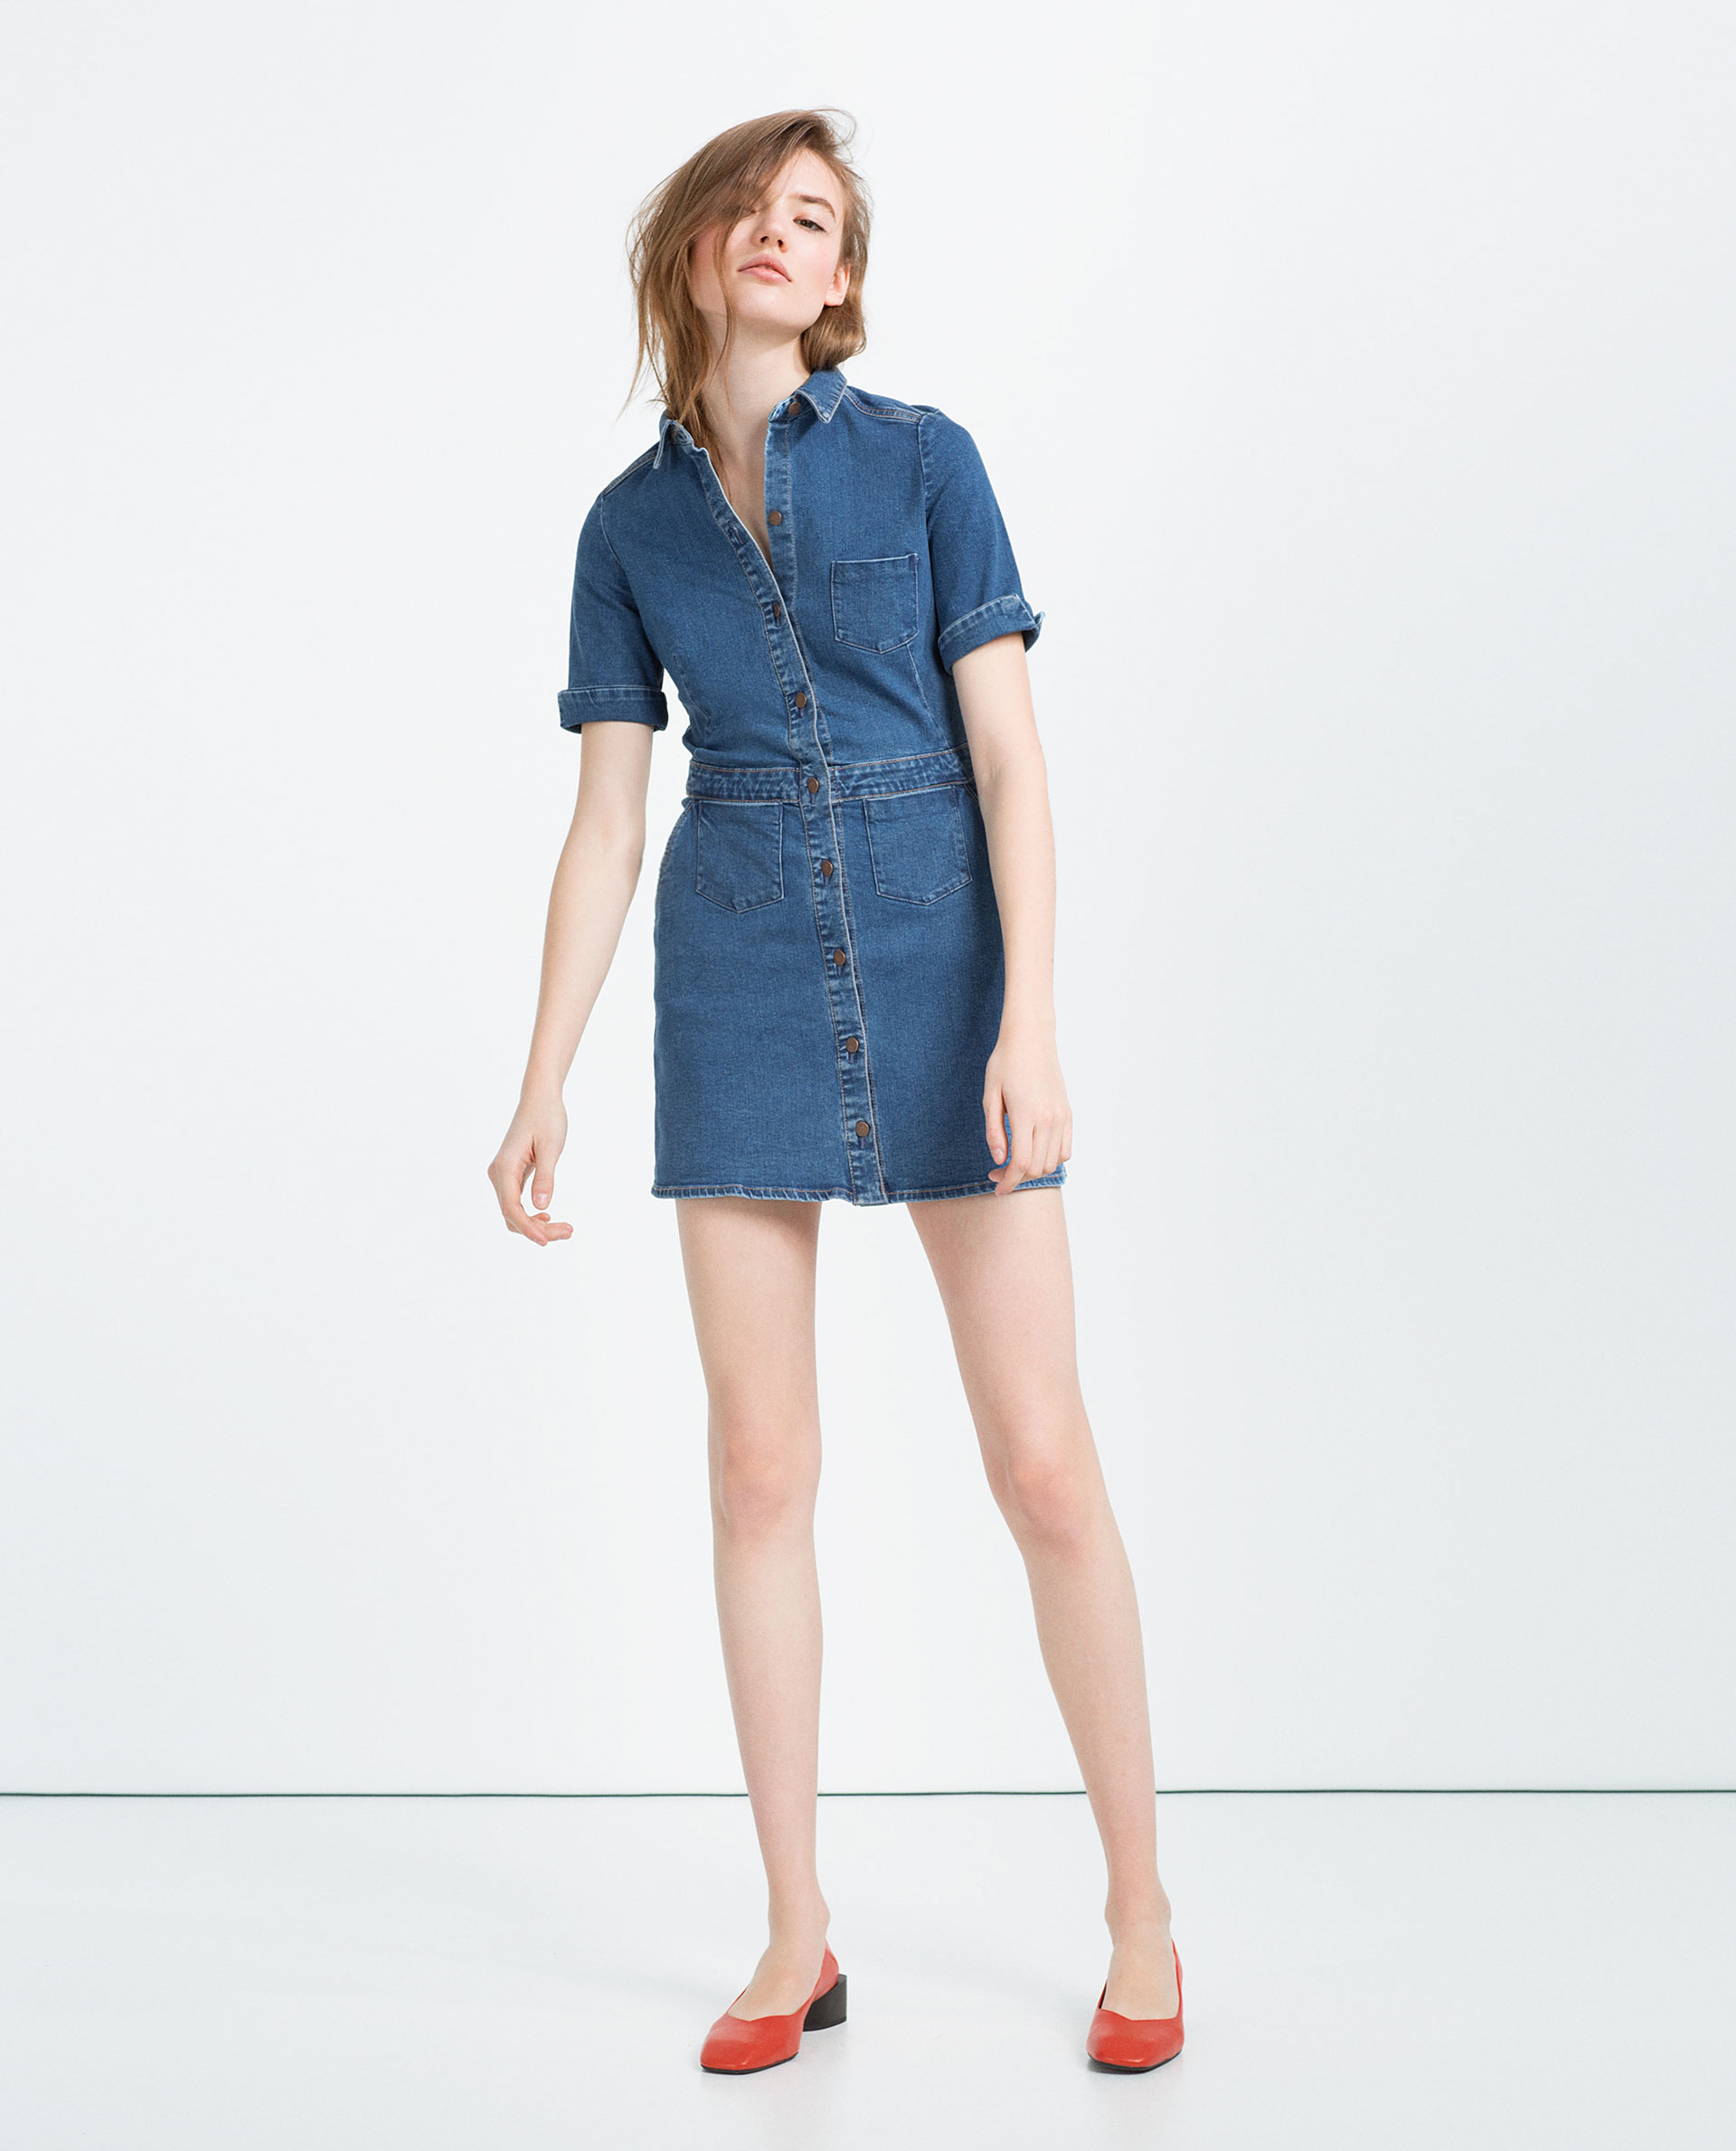 Zara Denim Mini Dress in Blue